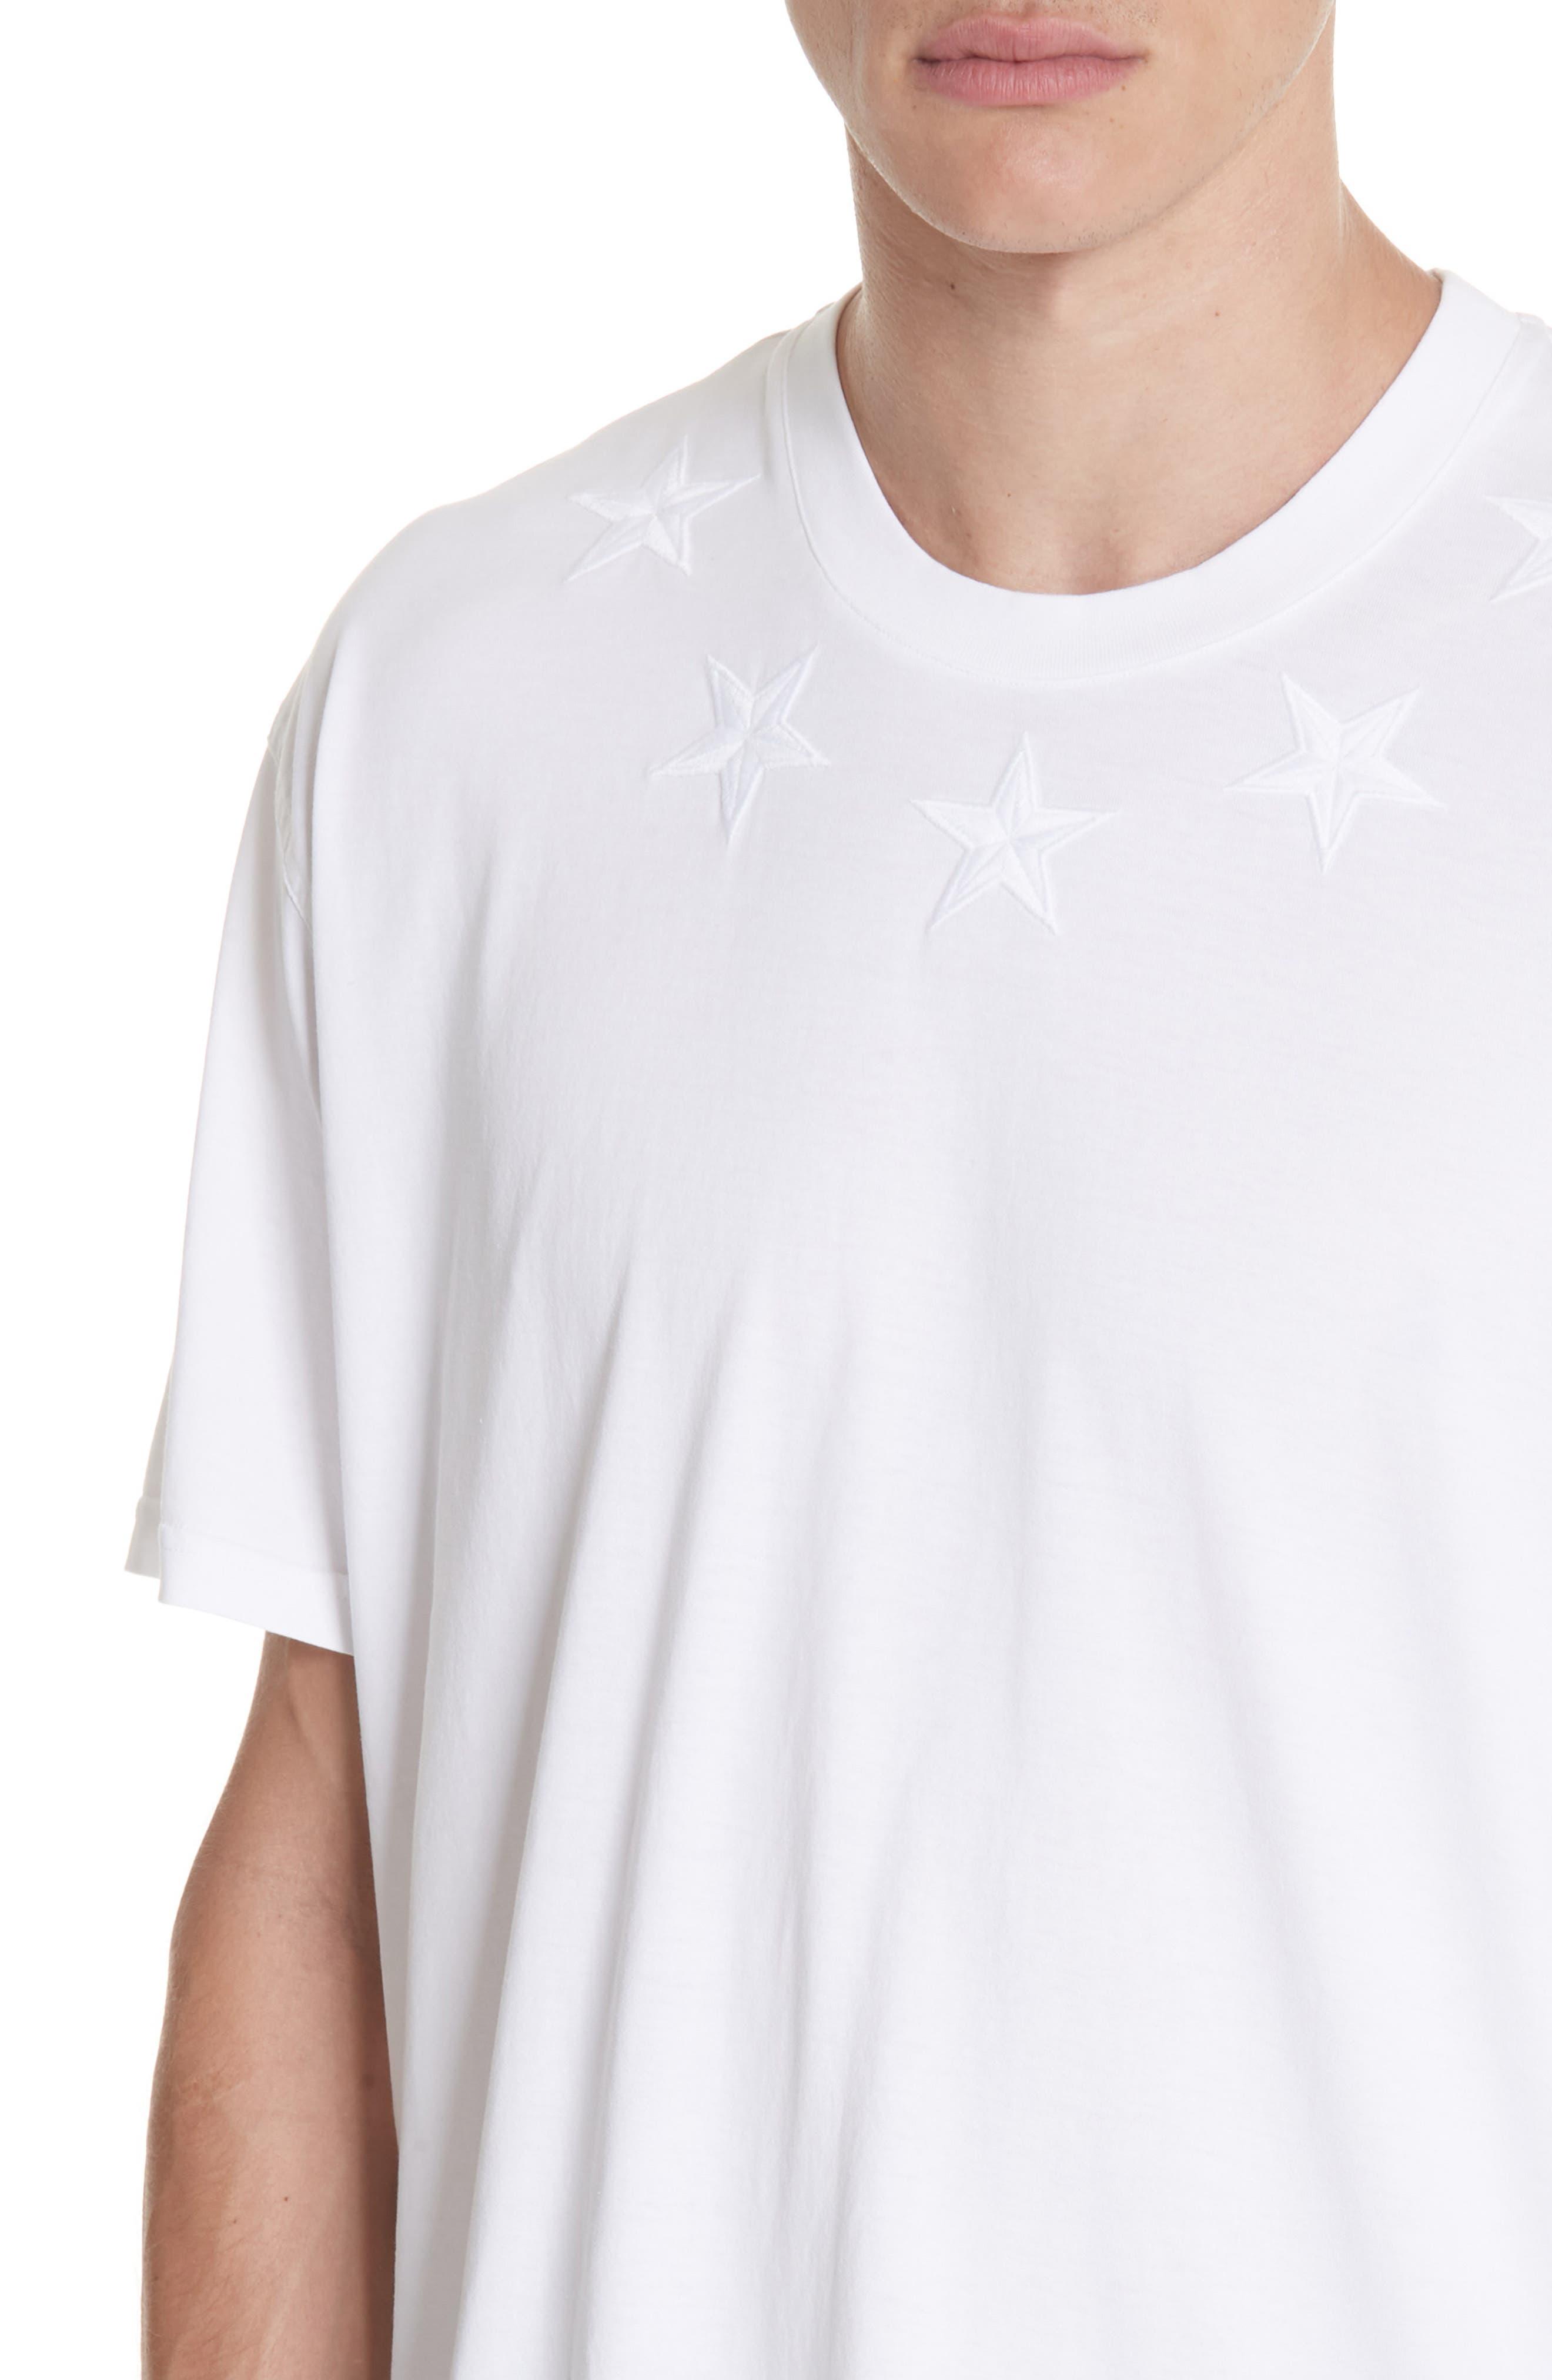 GIVENCHY,                             Star Appliqué T-Shirt,                             Alternate thumbnail 4, color,                             WHITE